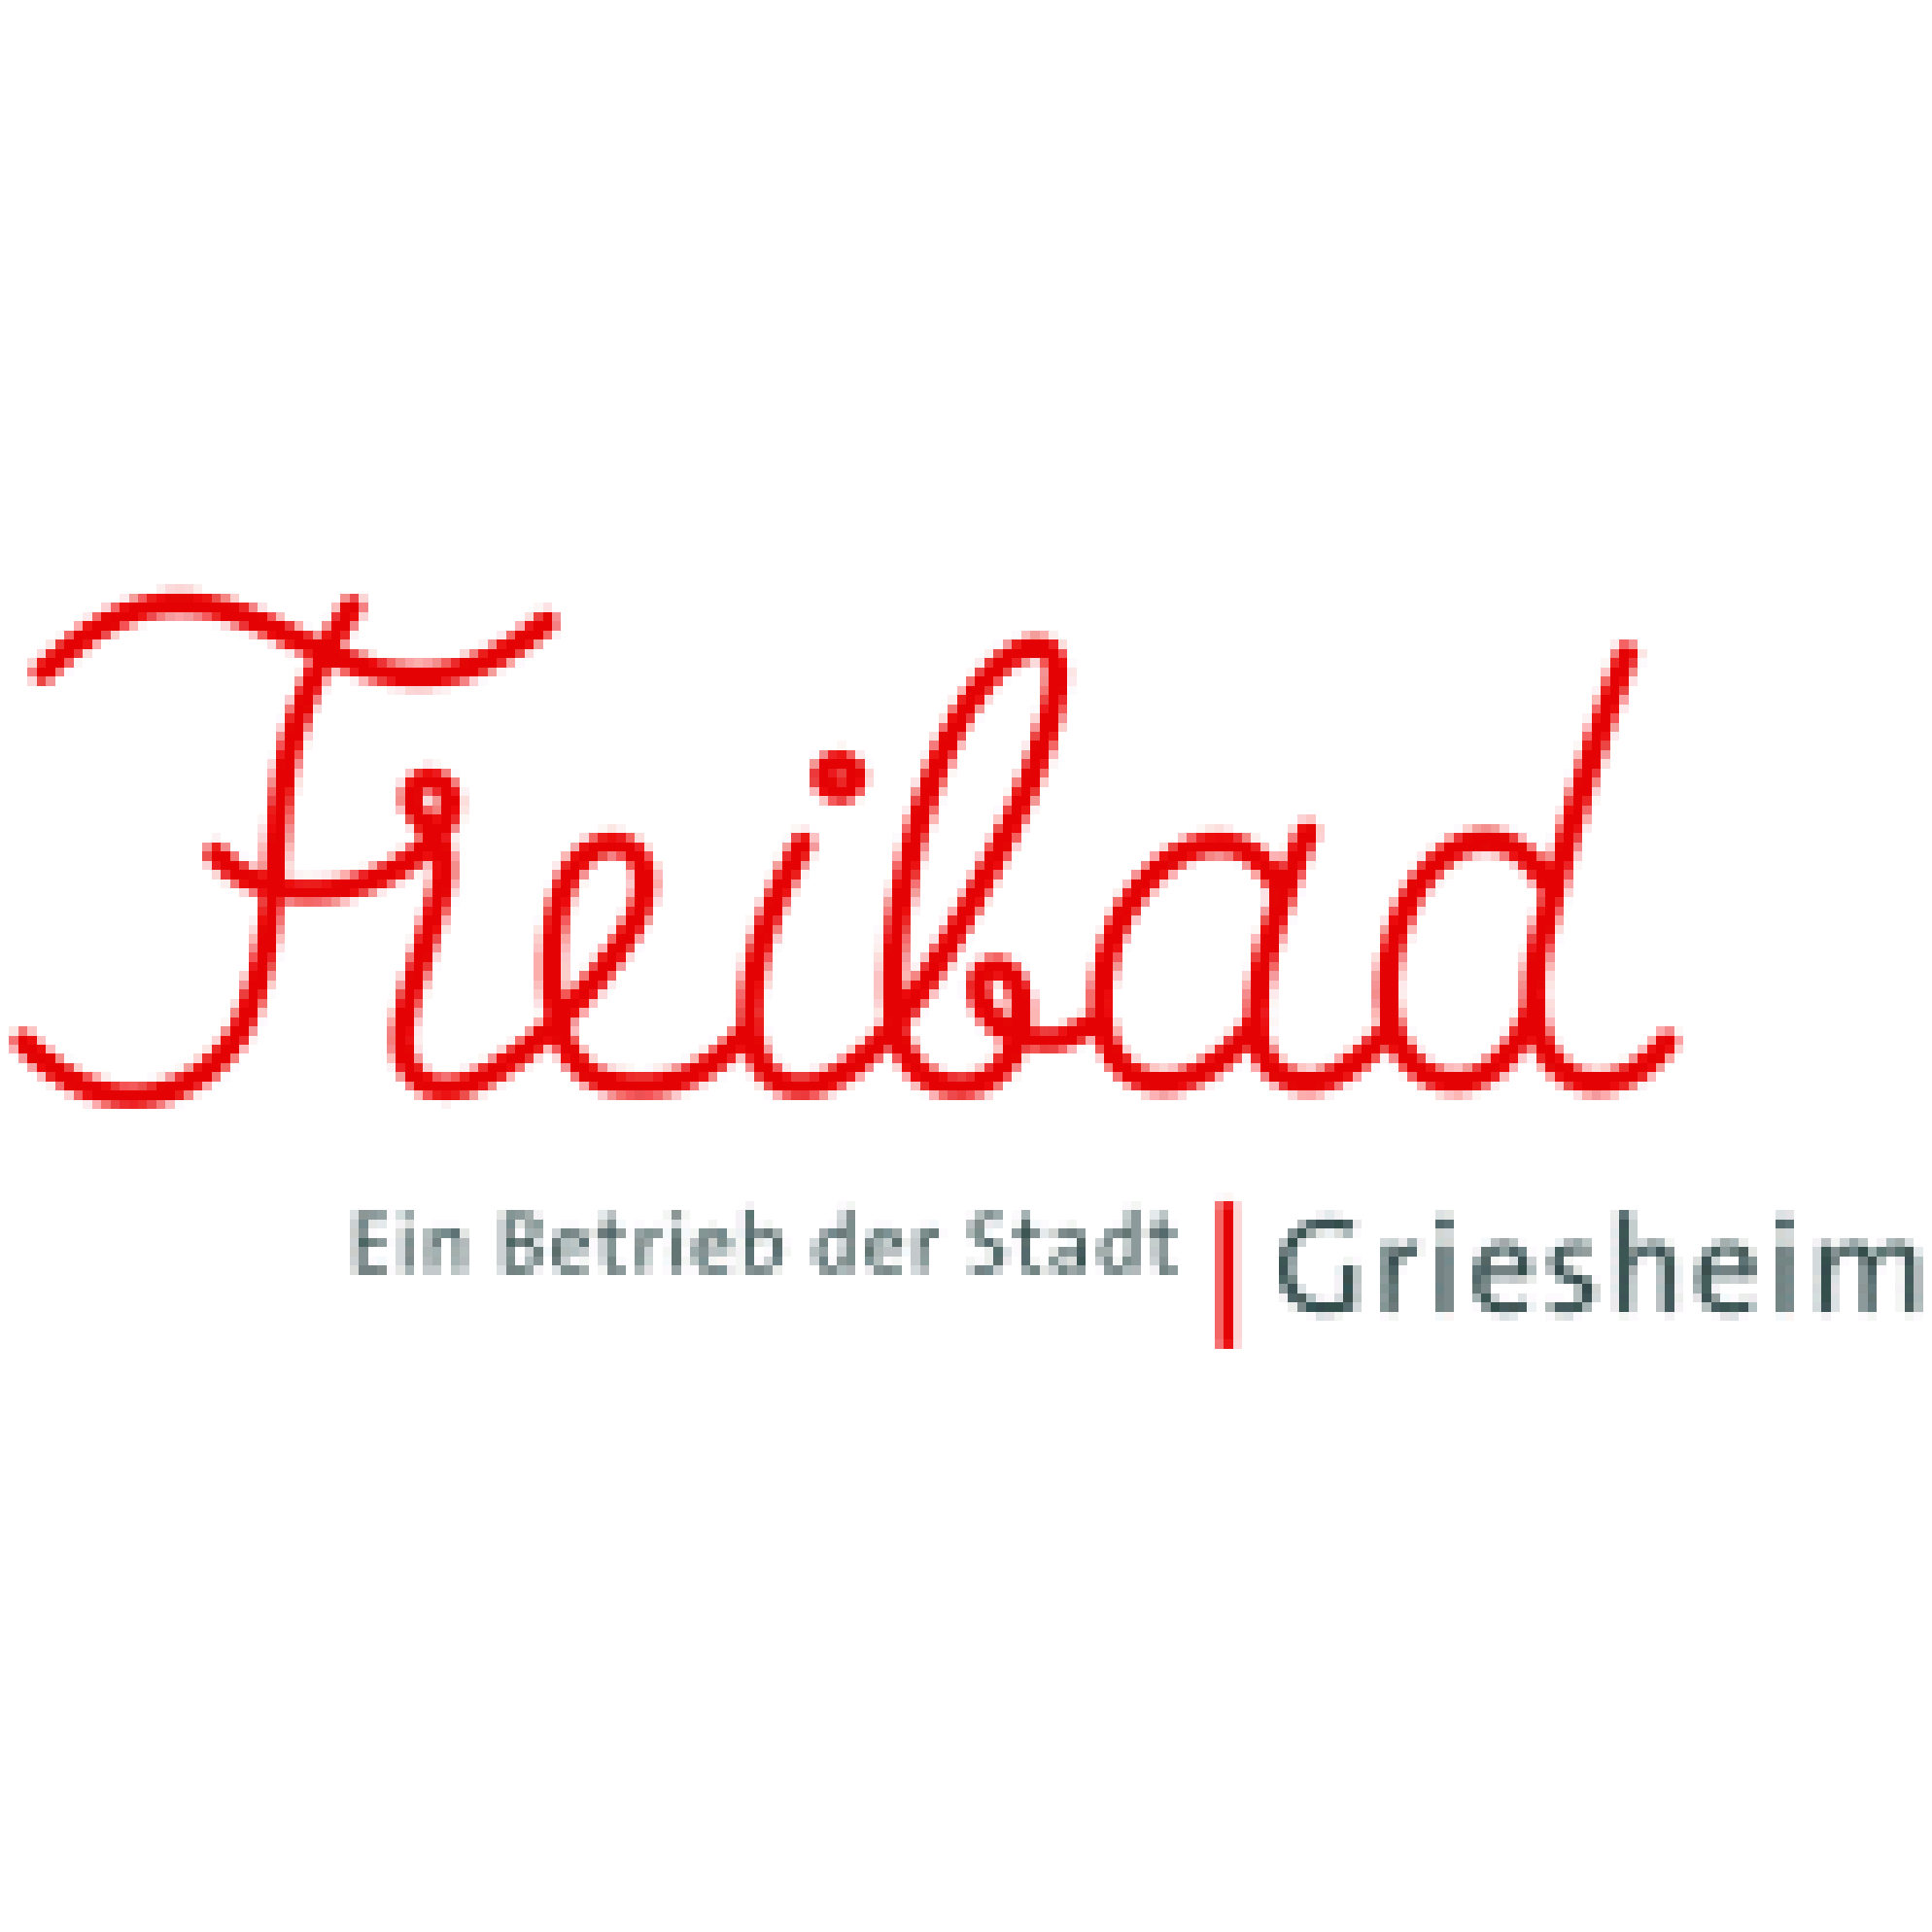 Freibad Griesheim